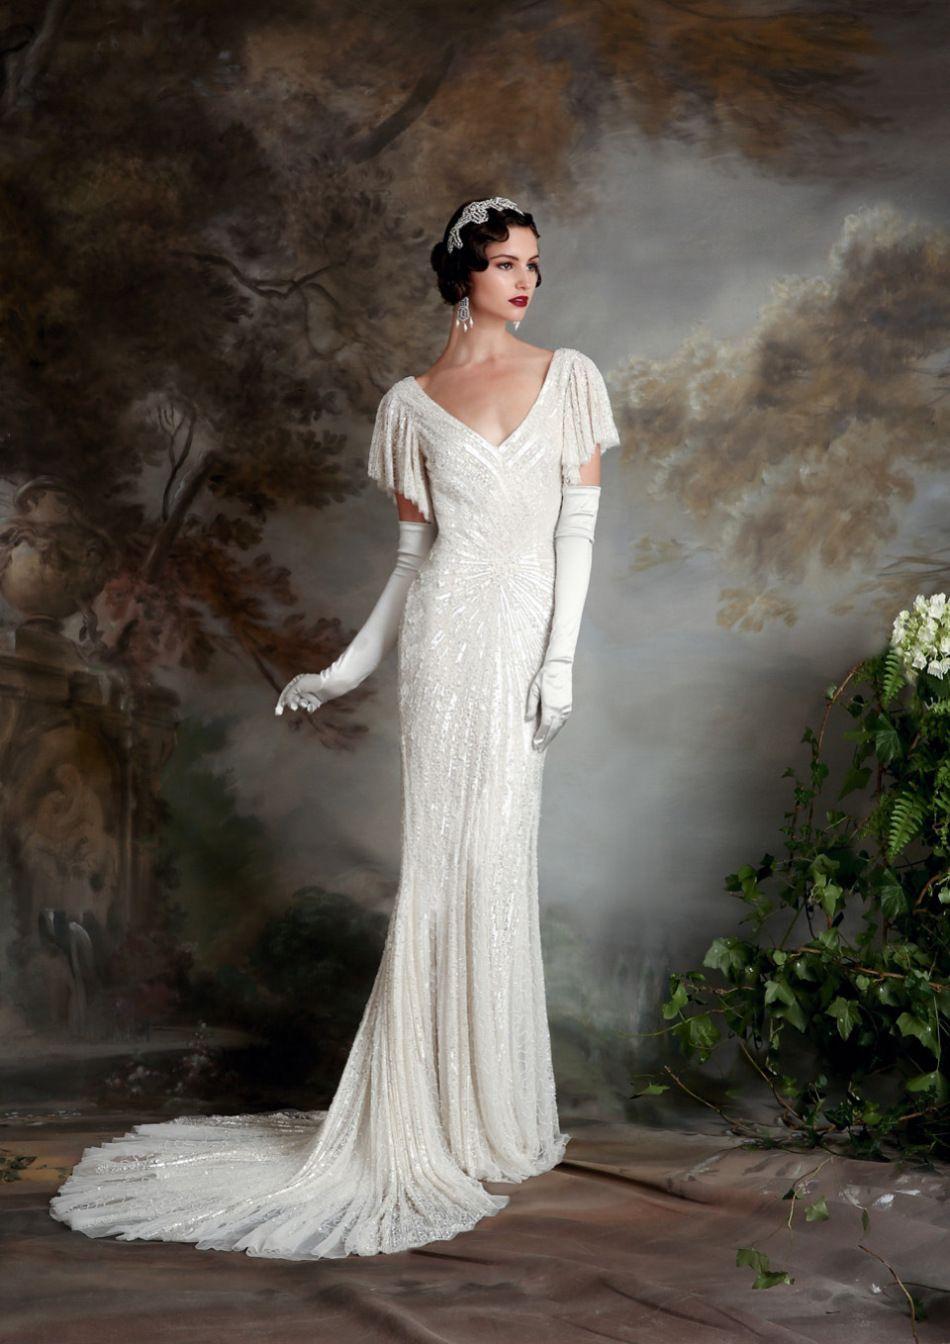 20 Art Deco Wedding Dress with Gatsby Glamour | Pinterest ...